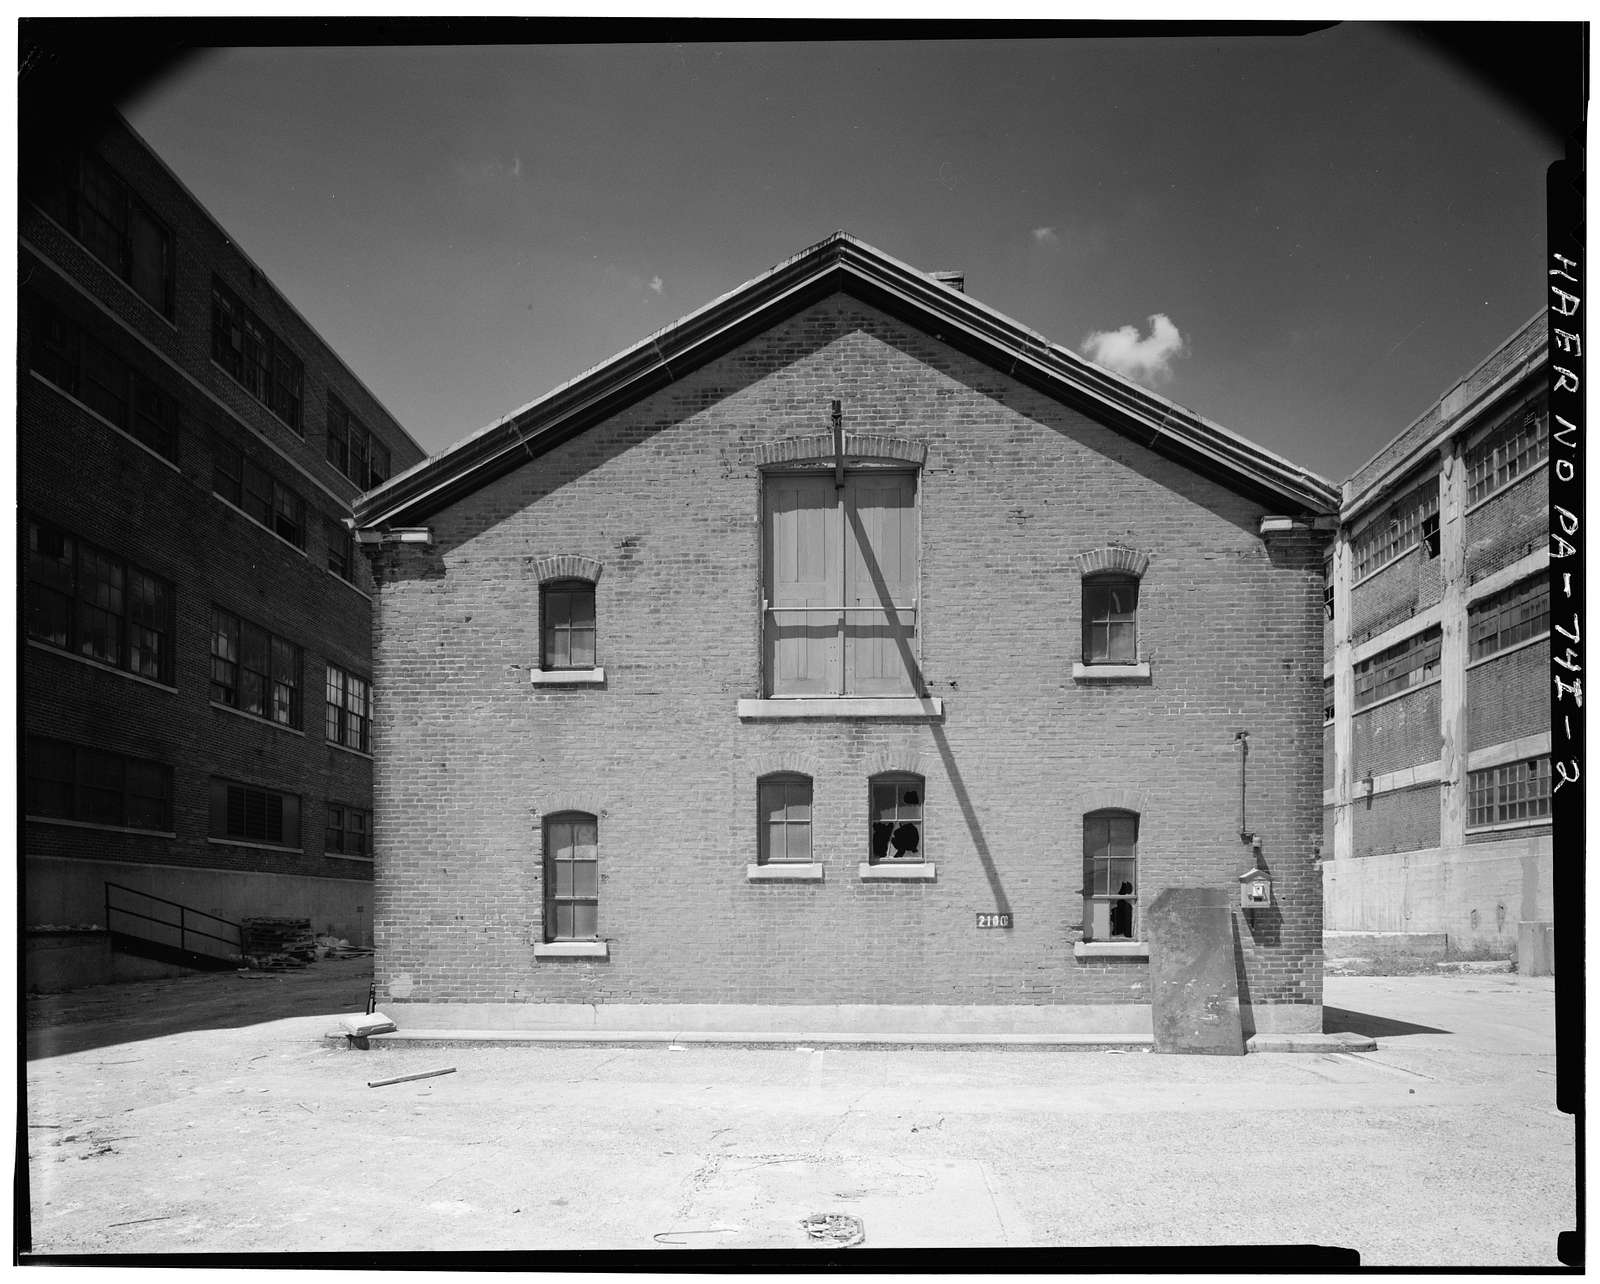 Frankford Arsenal, Building No. 206, Bridge & Tacony Streets, Philadelphia, Philadelphia County, PA